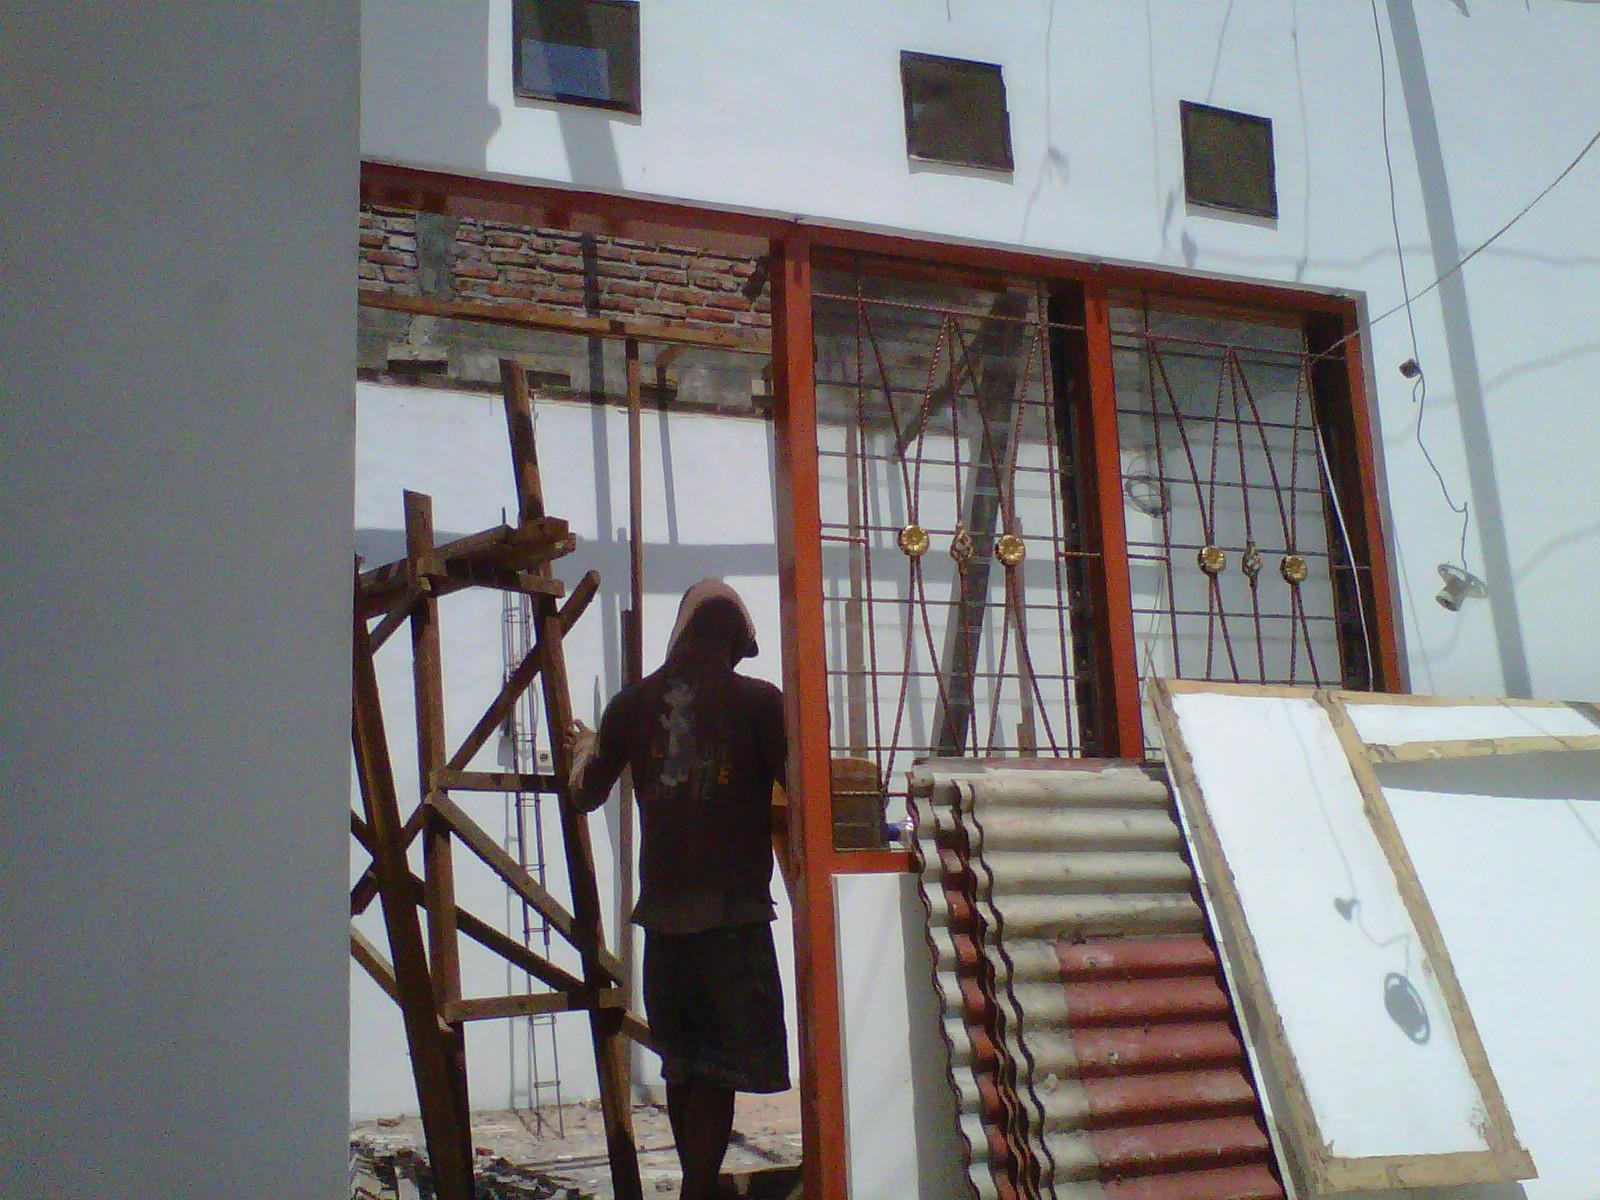 kanopi baja ringan di bali renovasi rumah kuda kayu kena rayap – cahaya makmur ...